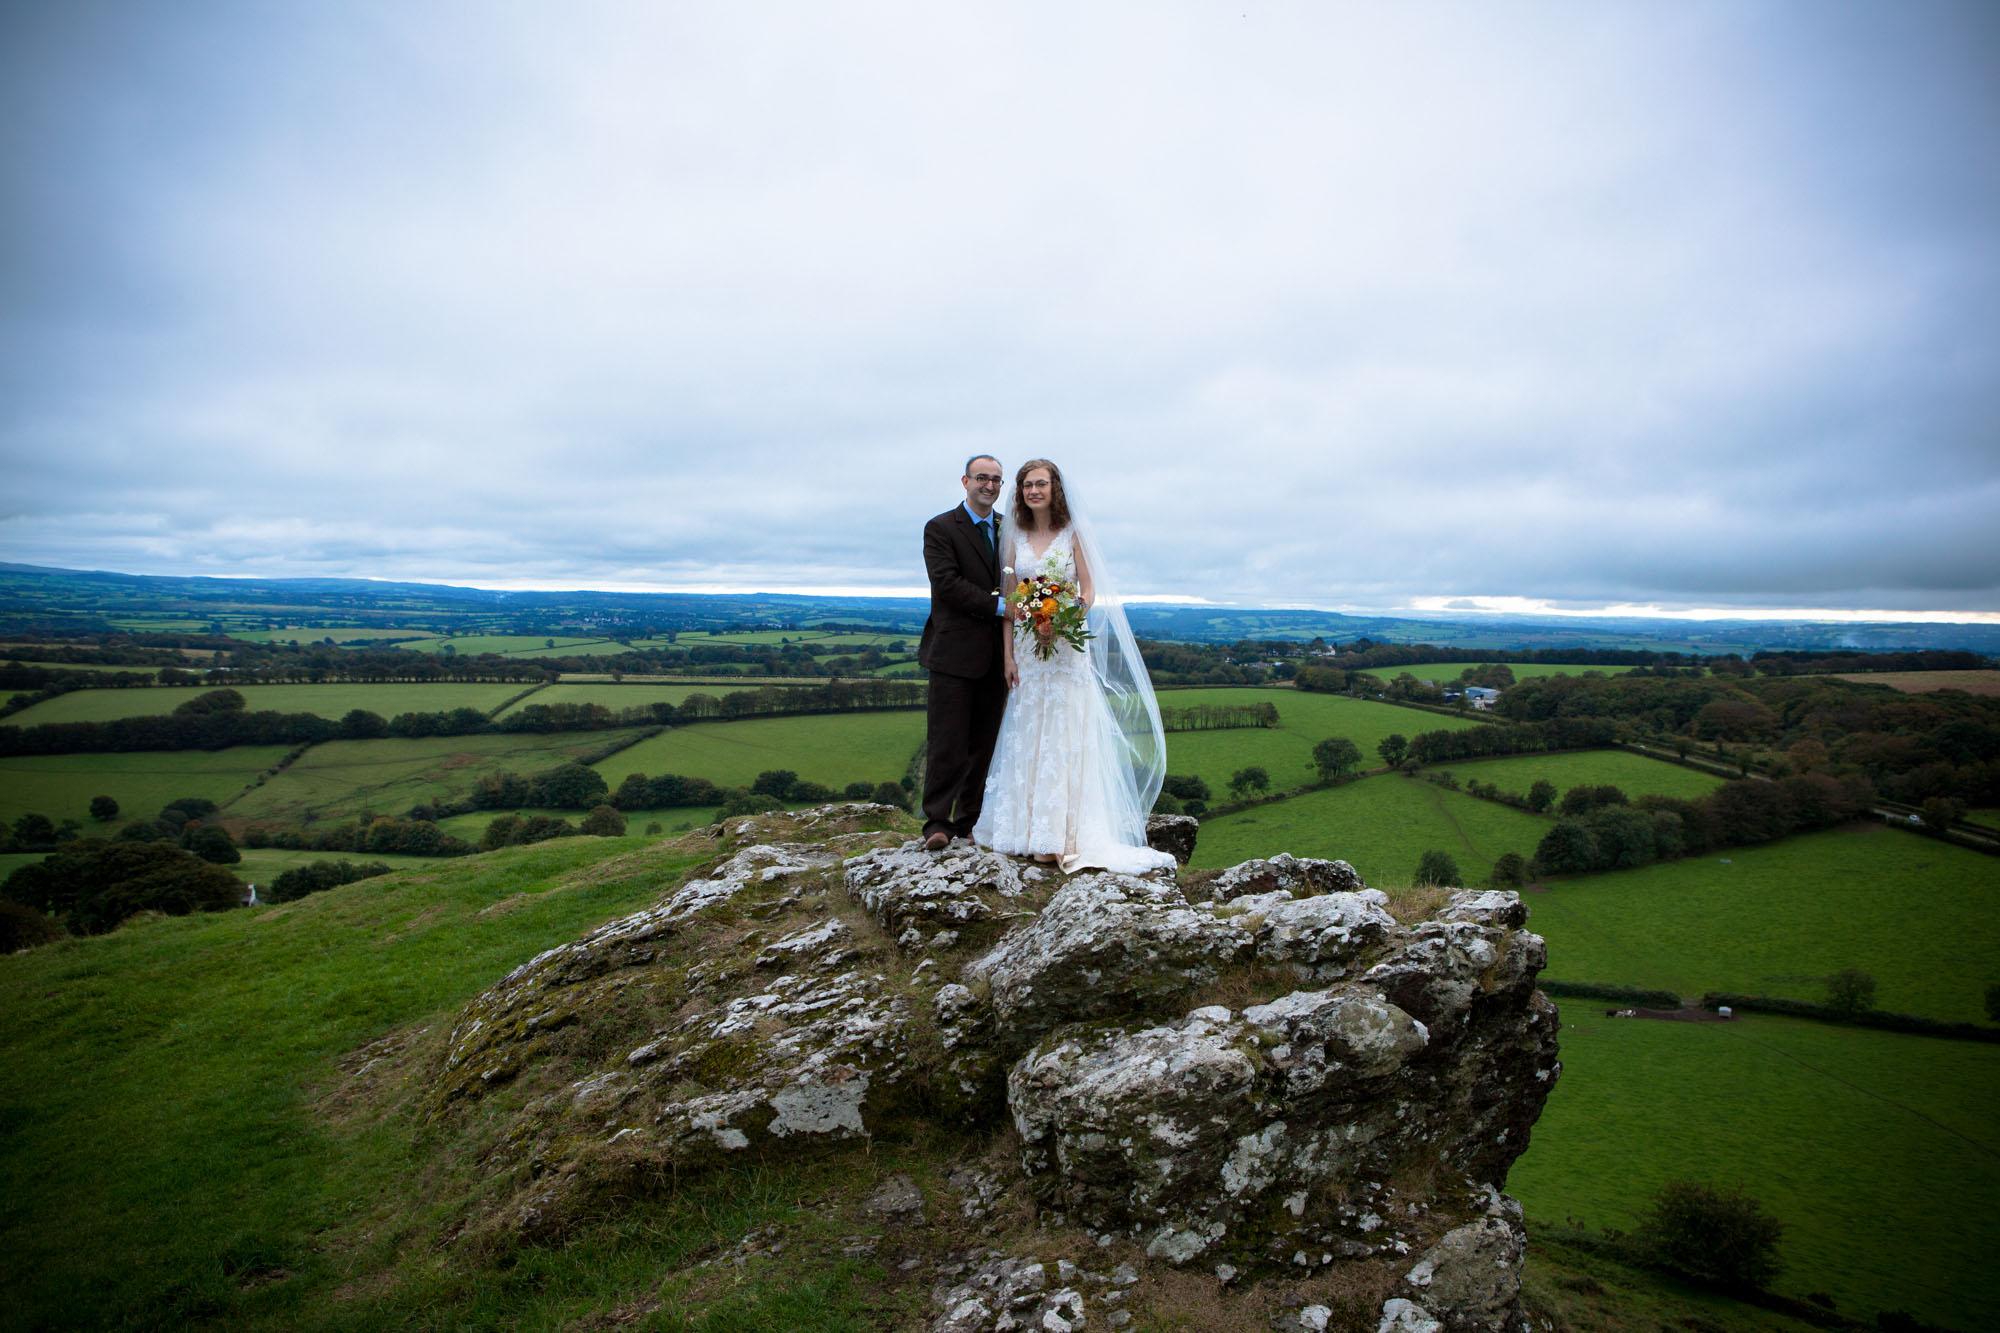 weddings-couples-love-photographer-oxford-london-jonathan-self-photography-64.jpg